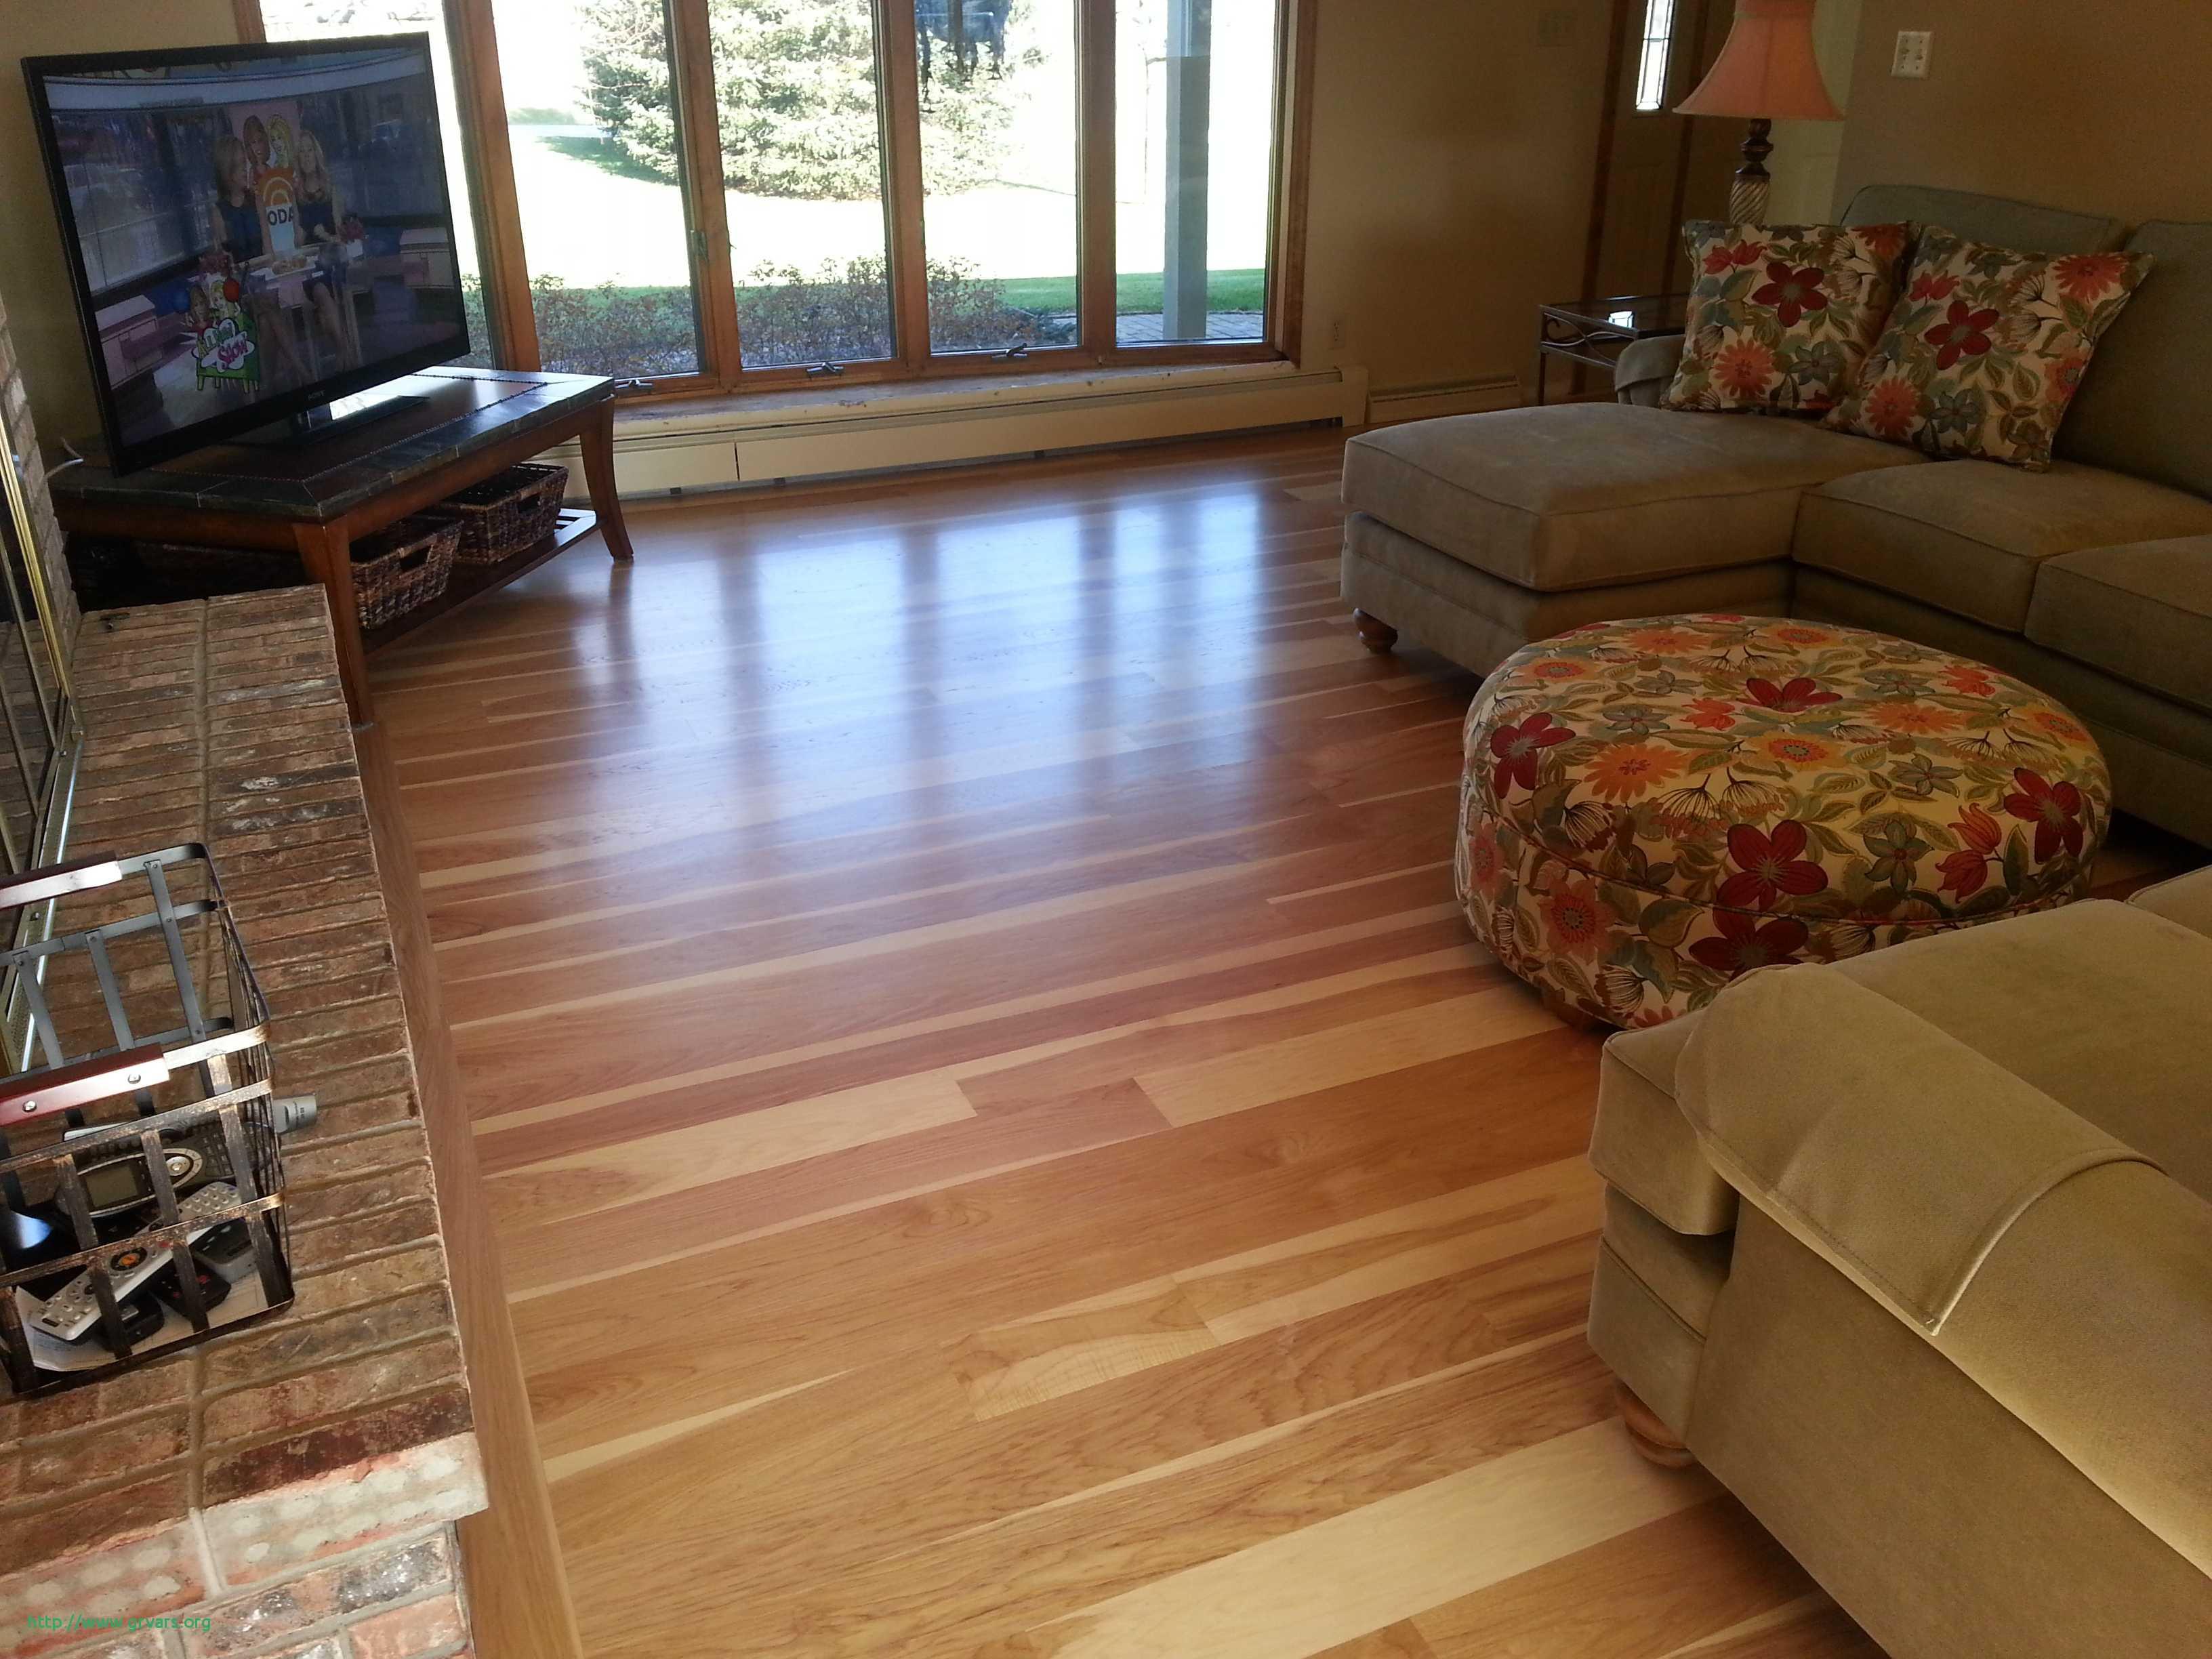 hardwood floor refinishing ri of 17 meilleur de how to install carpet on hardwood floor ideas blog in custom hickory wide plank hardwood floor miwlaukee wi